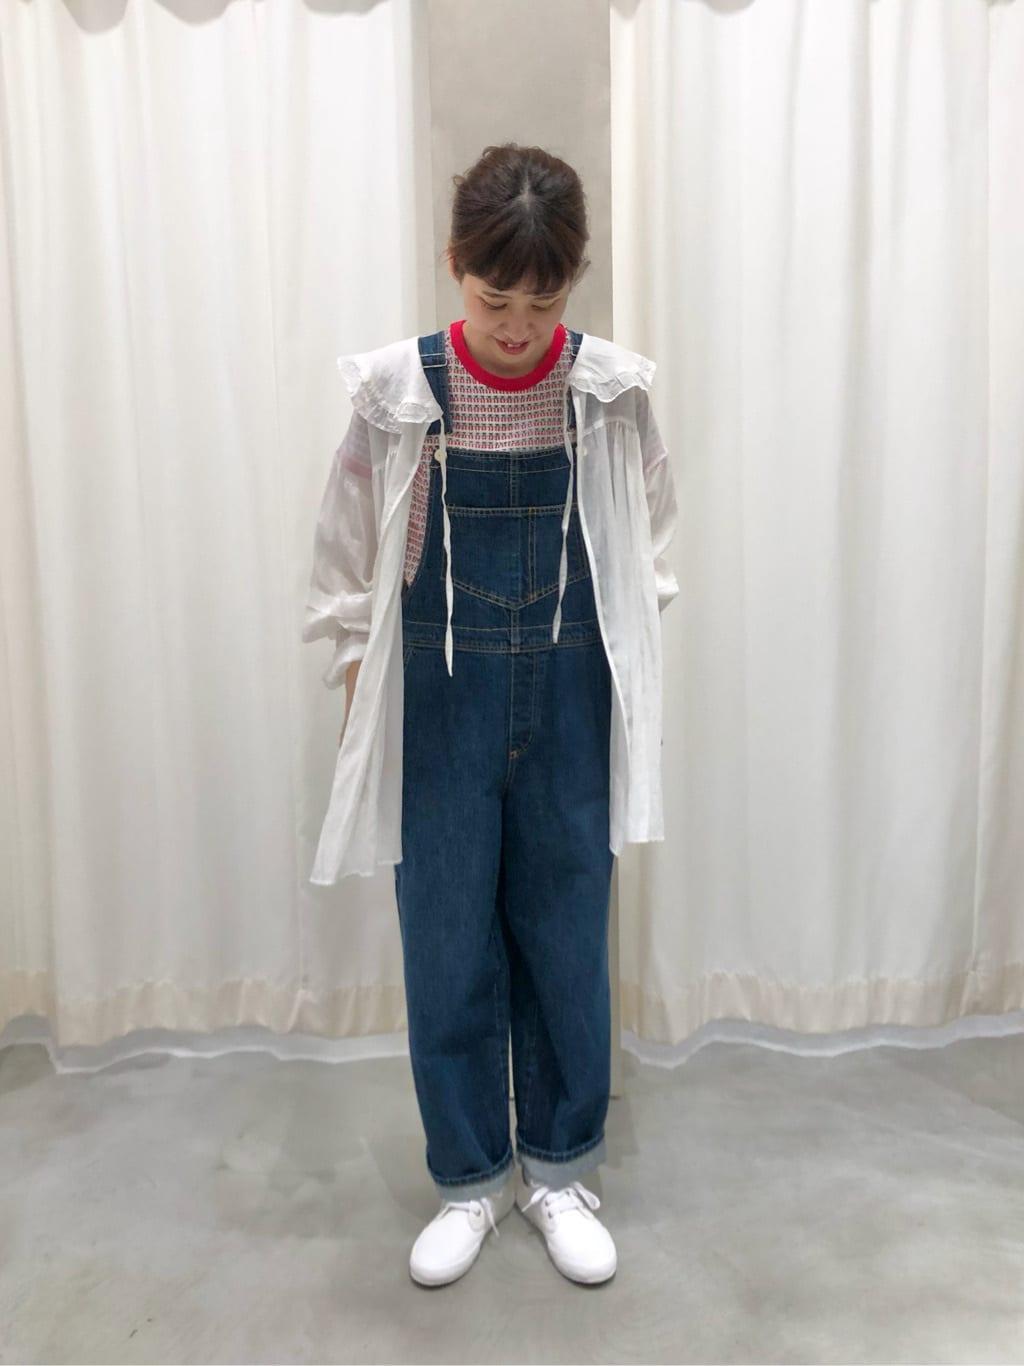 - CHILD WOMAN CHILD WOMAN , PAR ICI 東京スカイツリータウン・ソラマチ 身長:160cm 2021.08.12